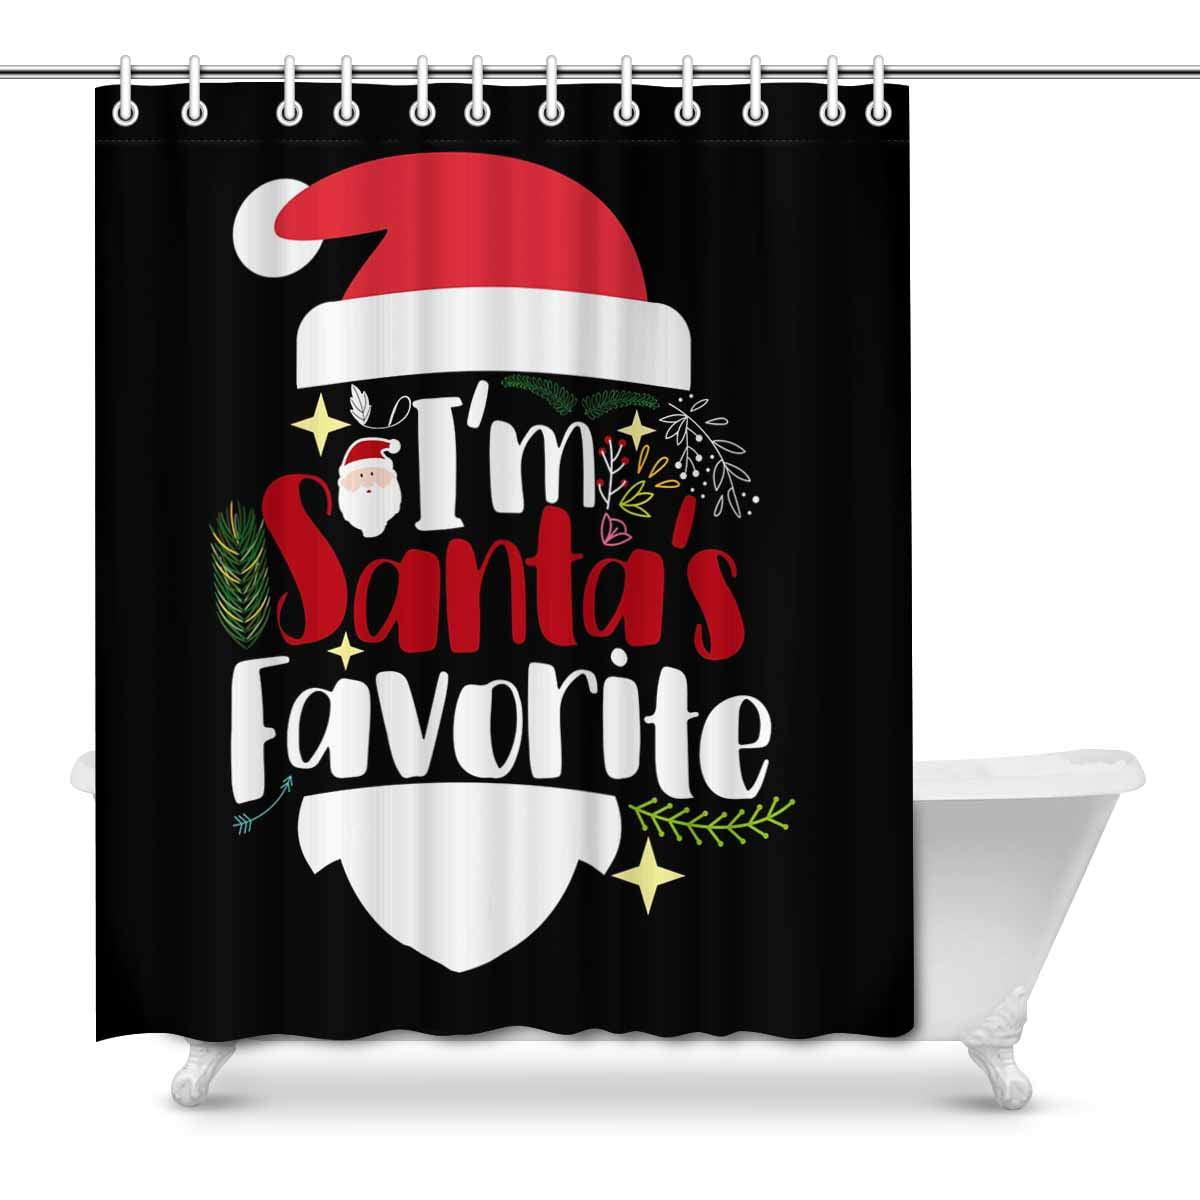 Favourite Bathroom Home Decor: MKHERT Funny Christmas Saying I'm Santas's Favorite Home